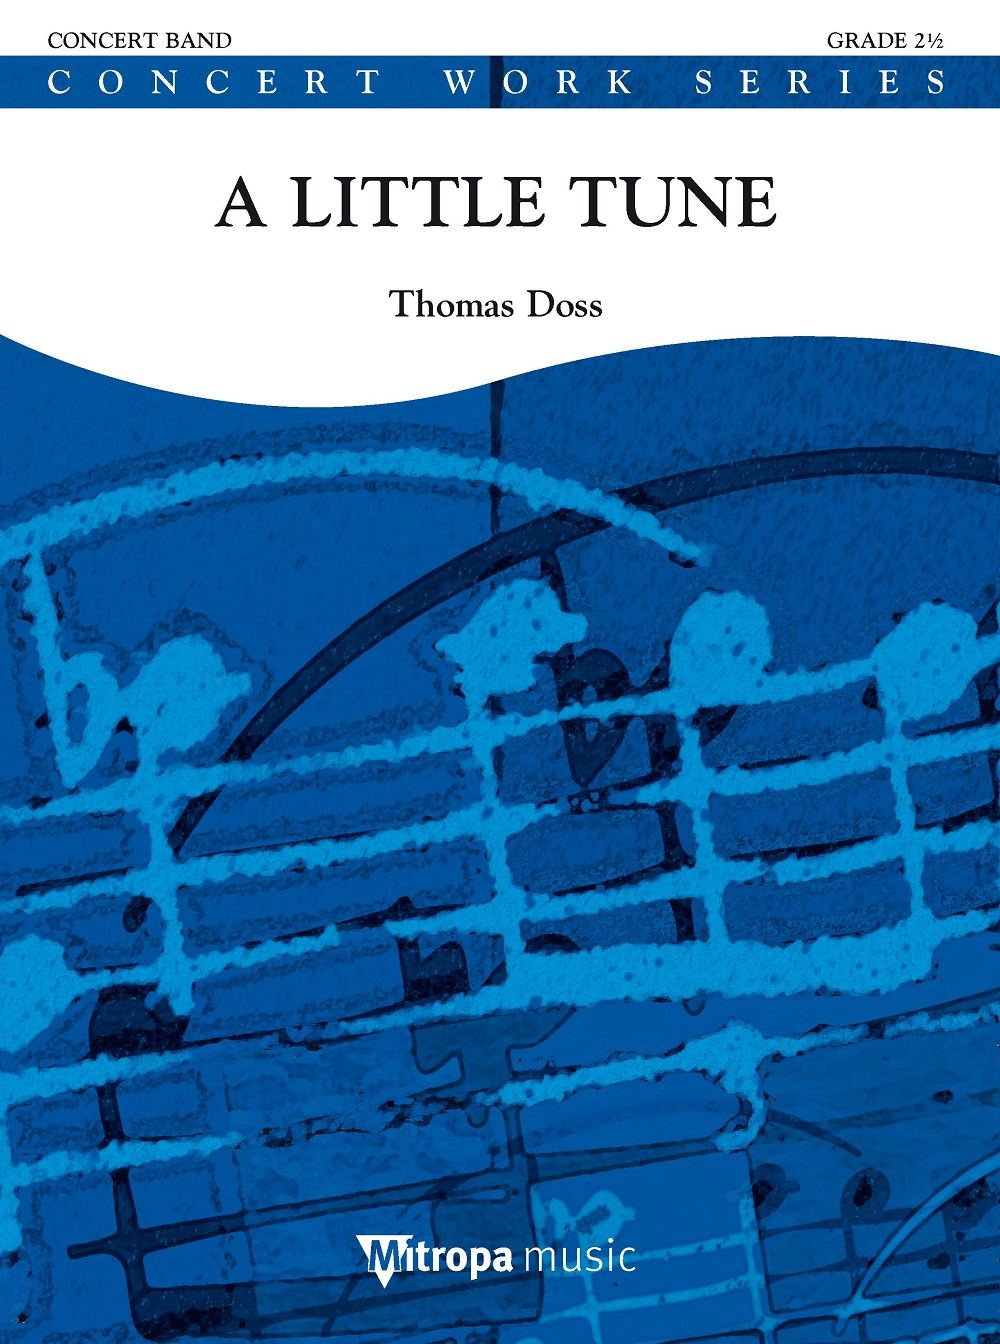 Thomas Doss: A Little Tune: Concert Band: Score